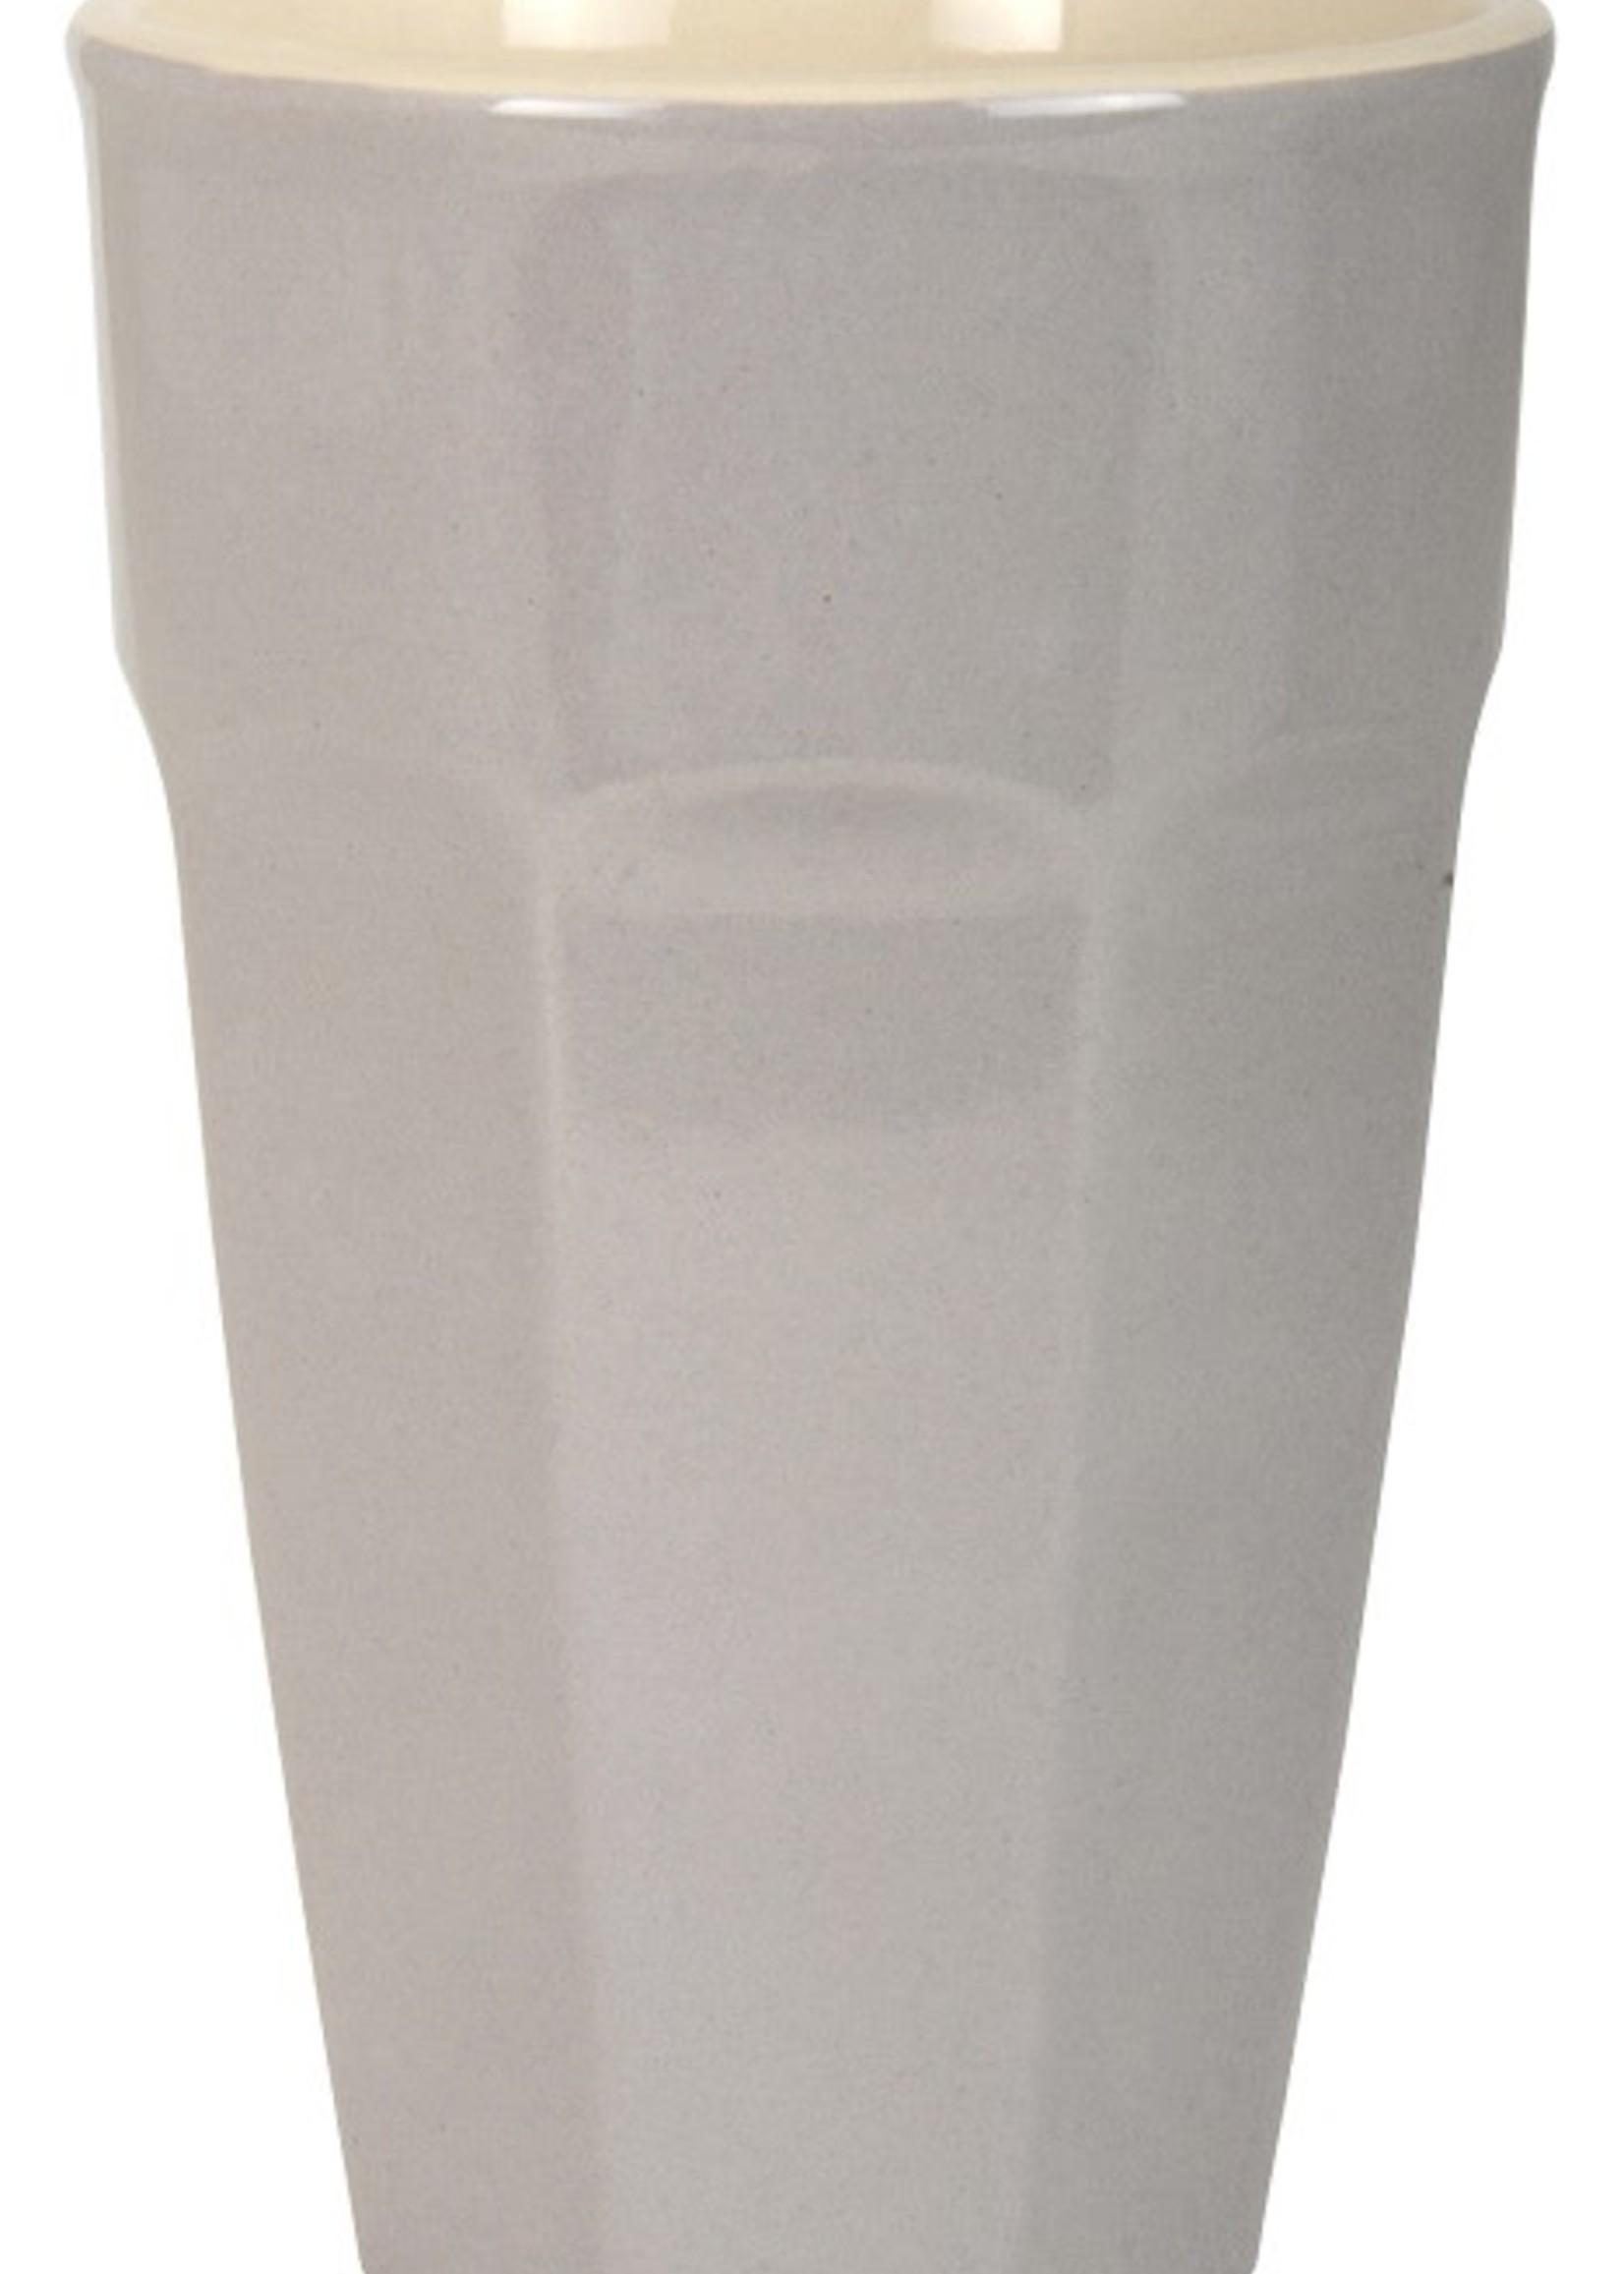 IB LAURSEN IBL Caffe Latte mug XL